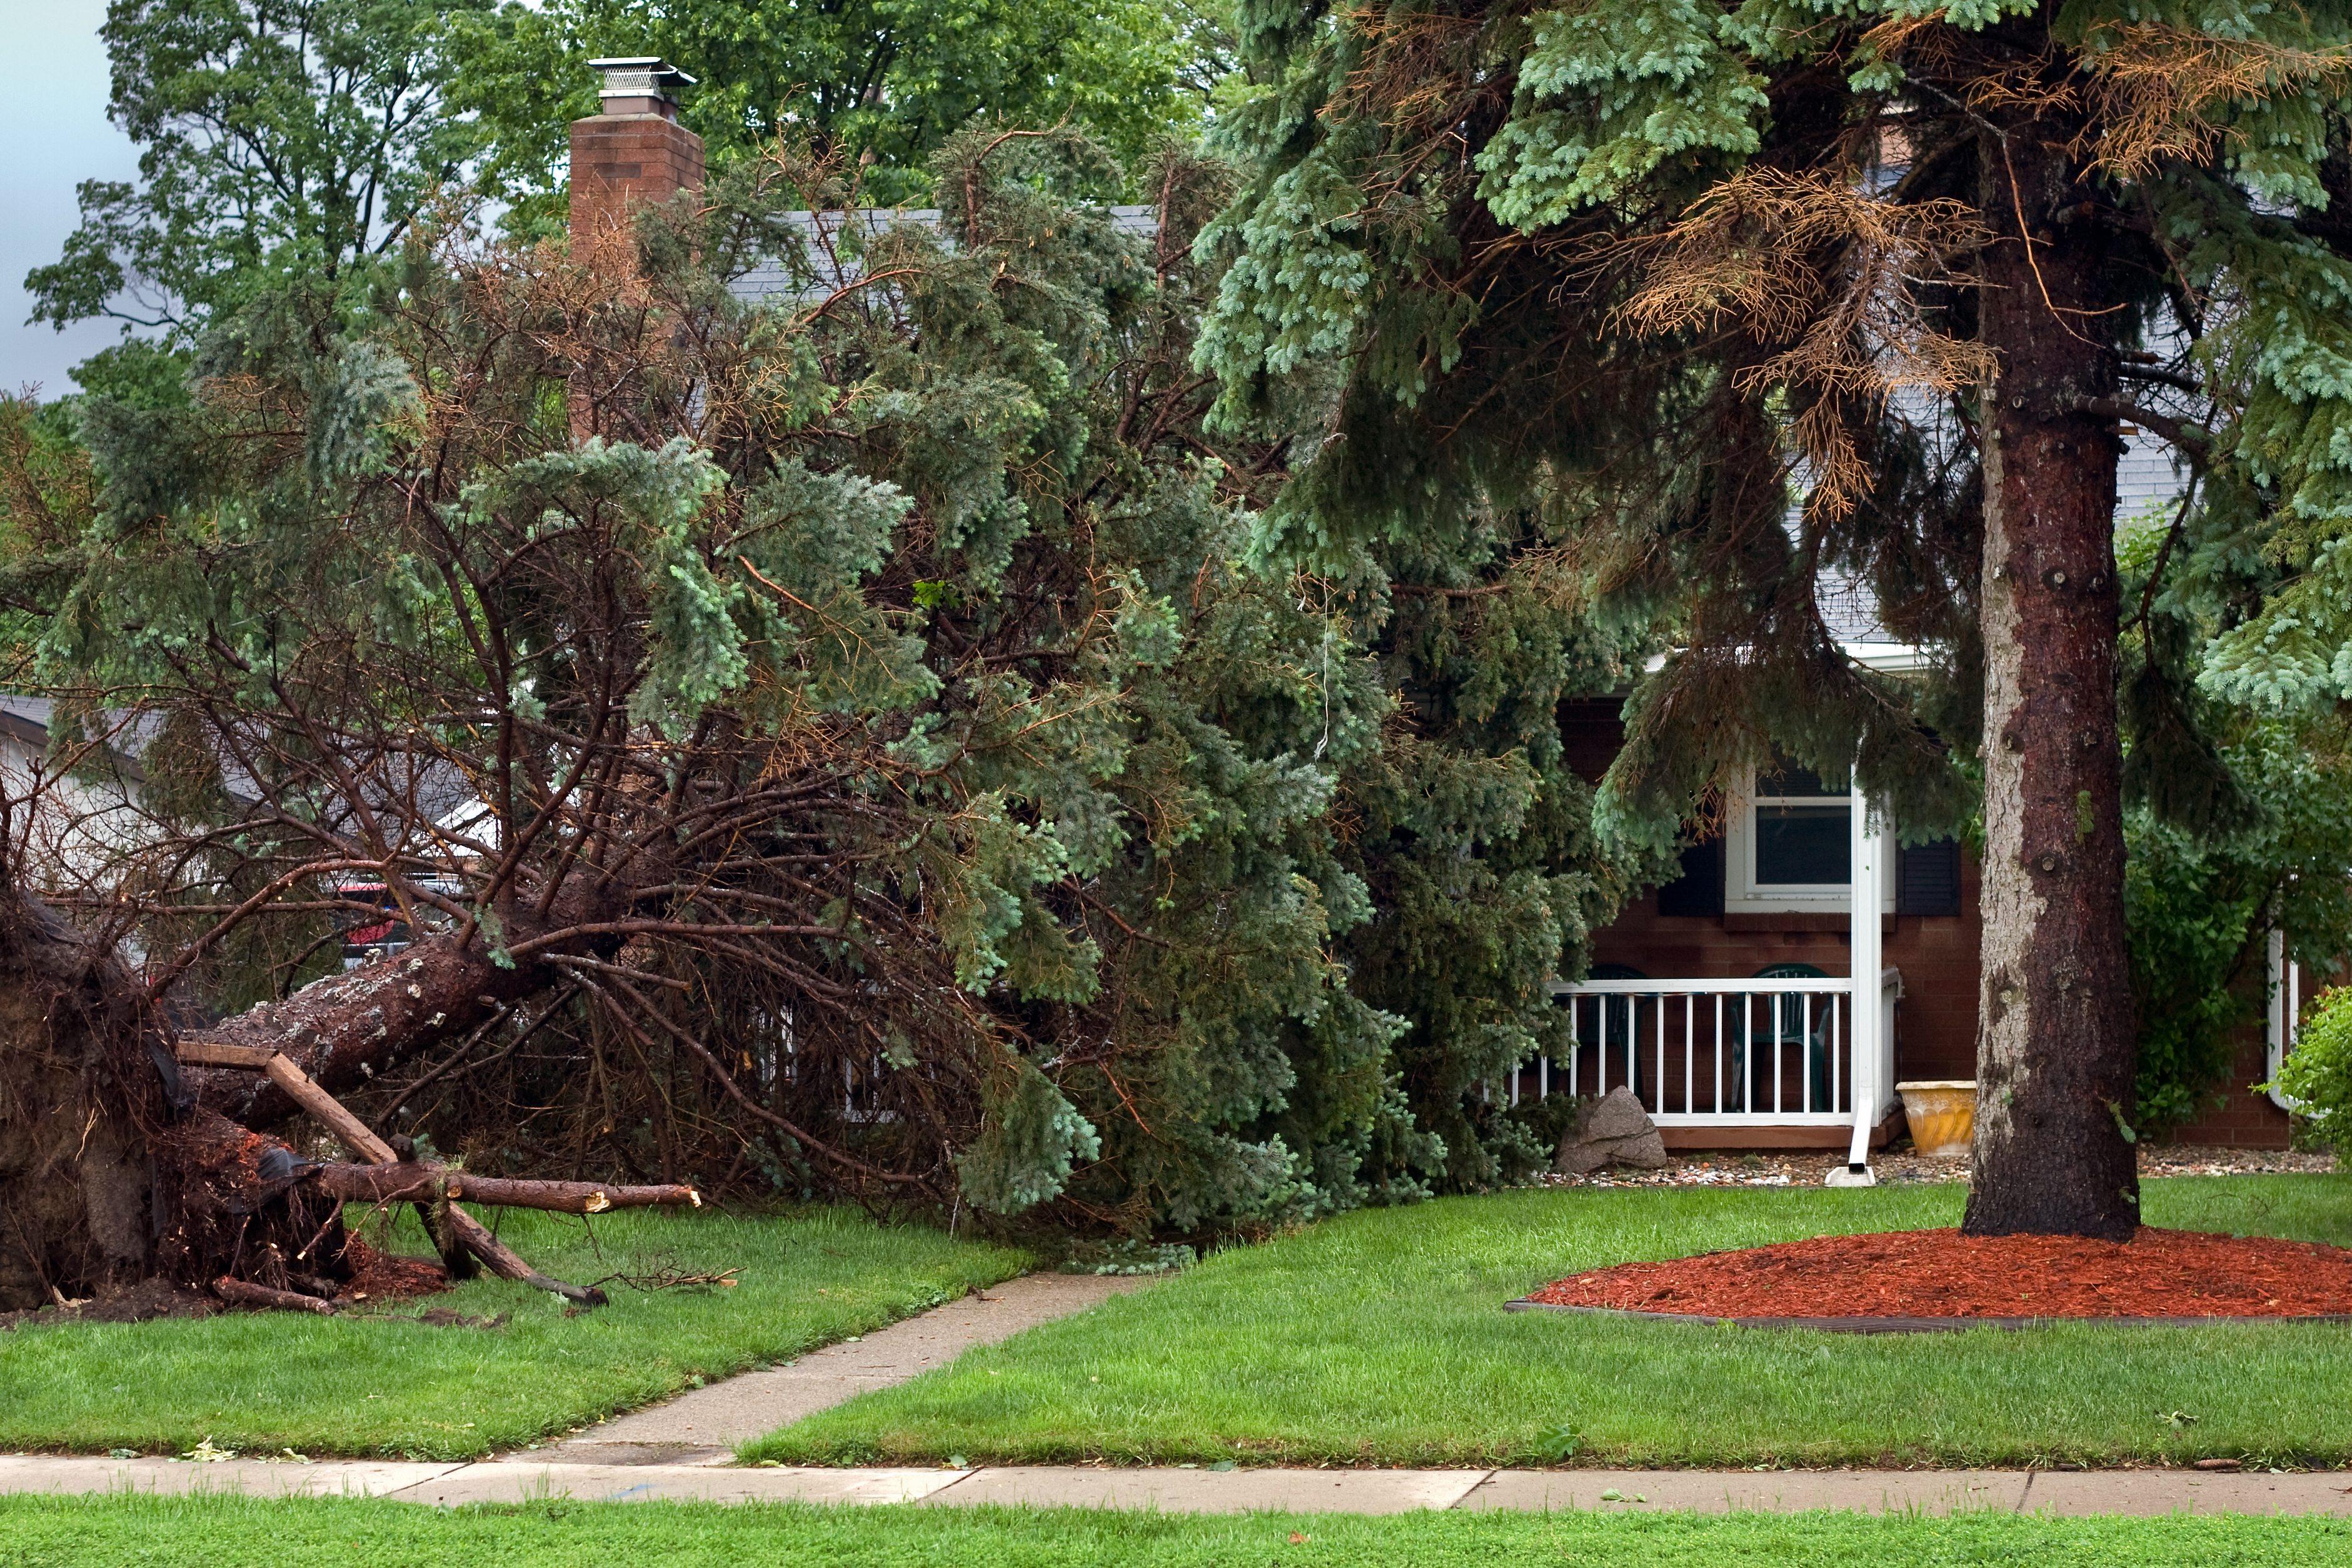 Tree Fallen on House - Storm Damage